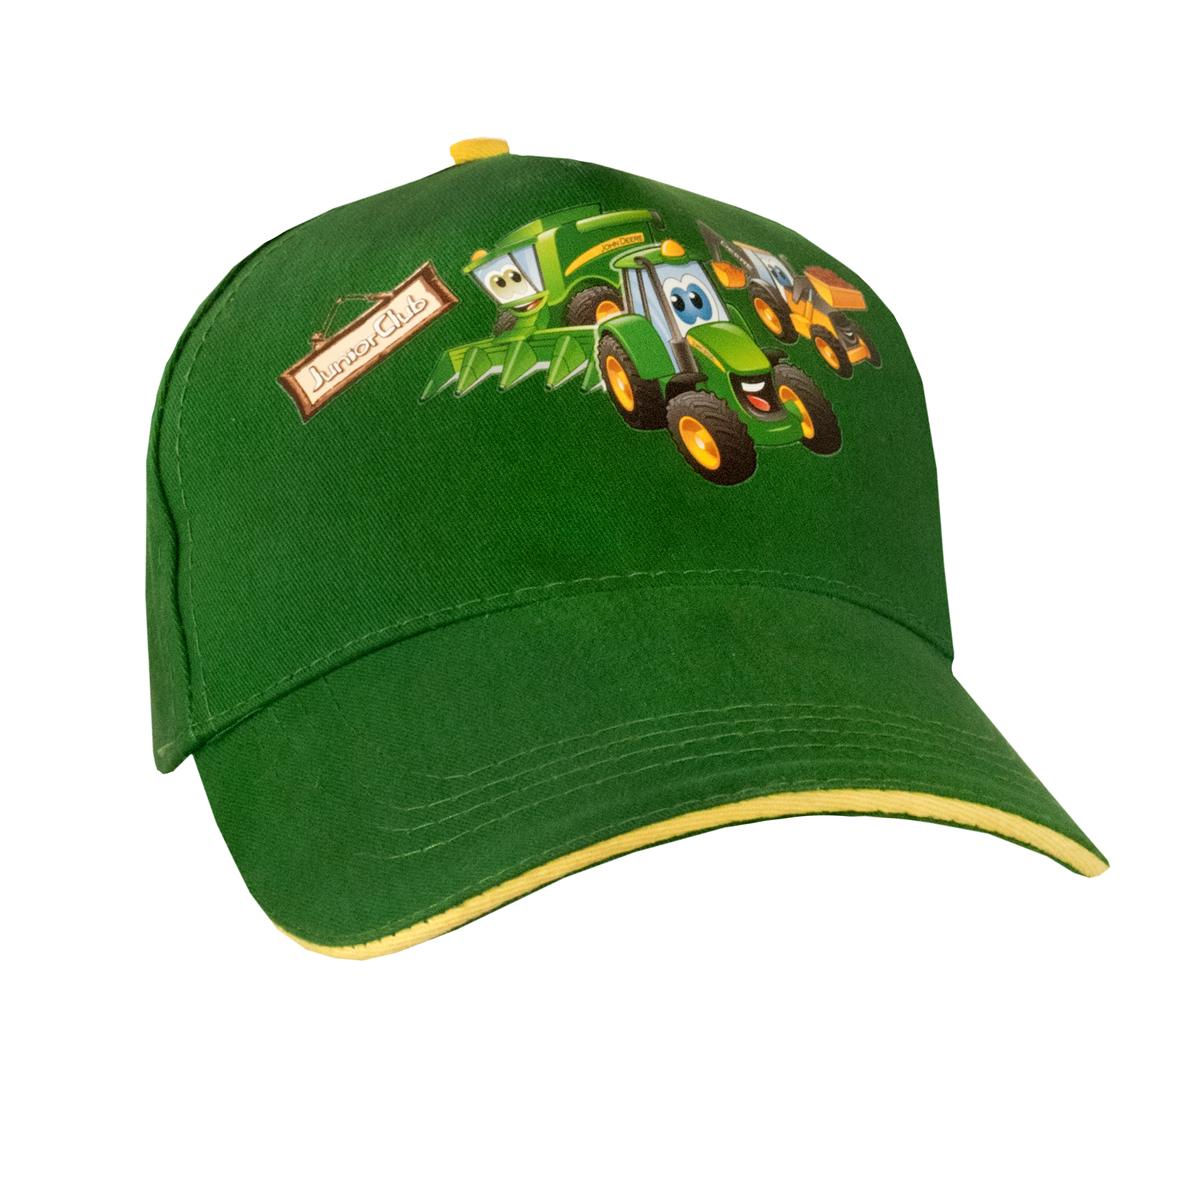 JOHN DEERE KIDS JUNIOR CLUB CAP GRN | Mascor Online Clothing, Toys and ...